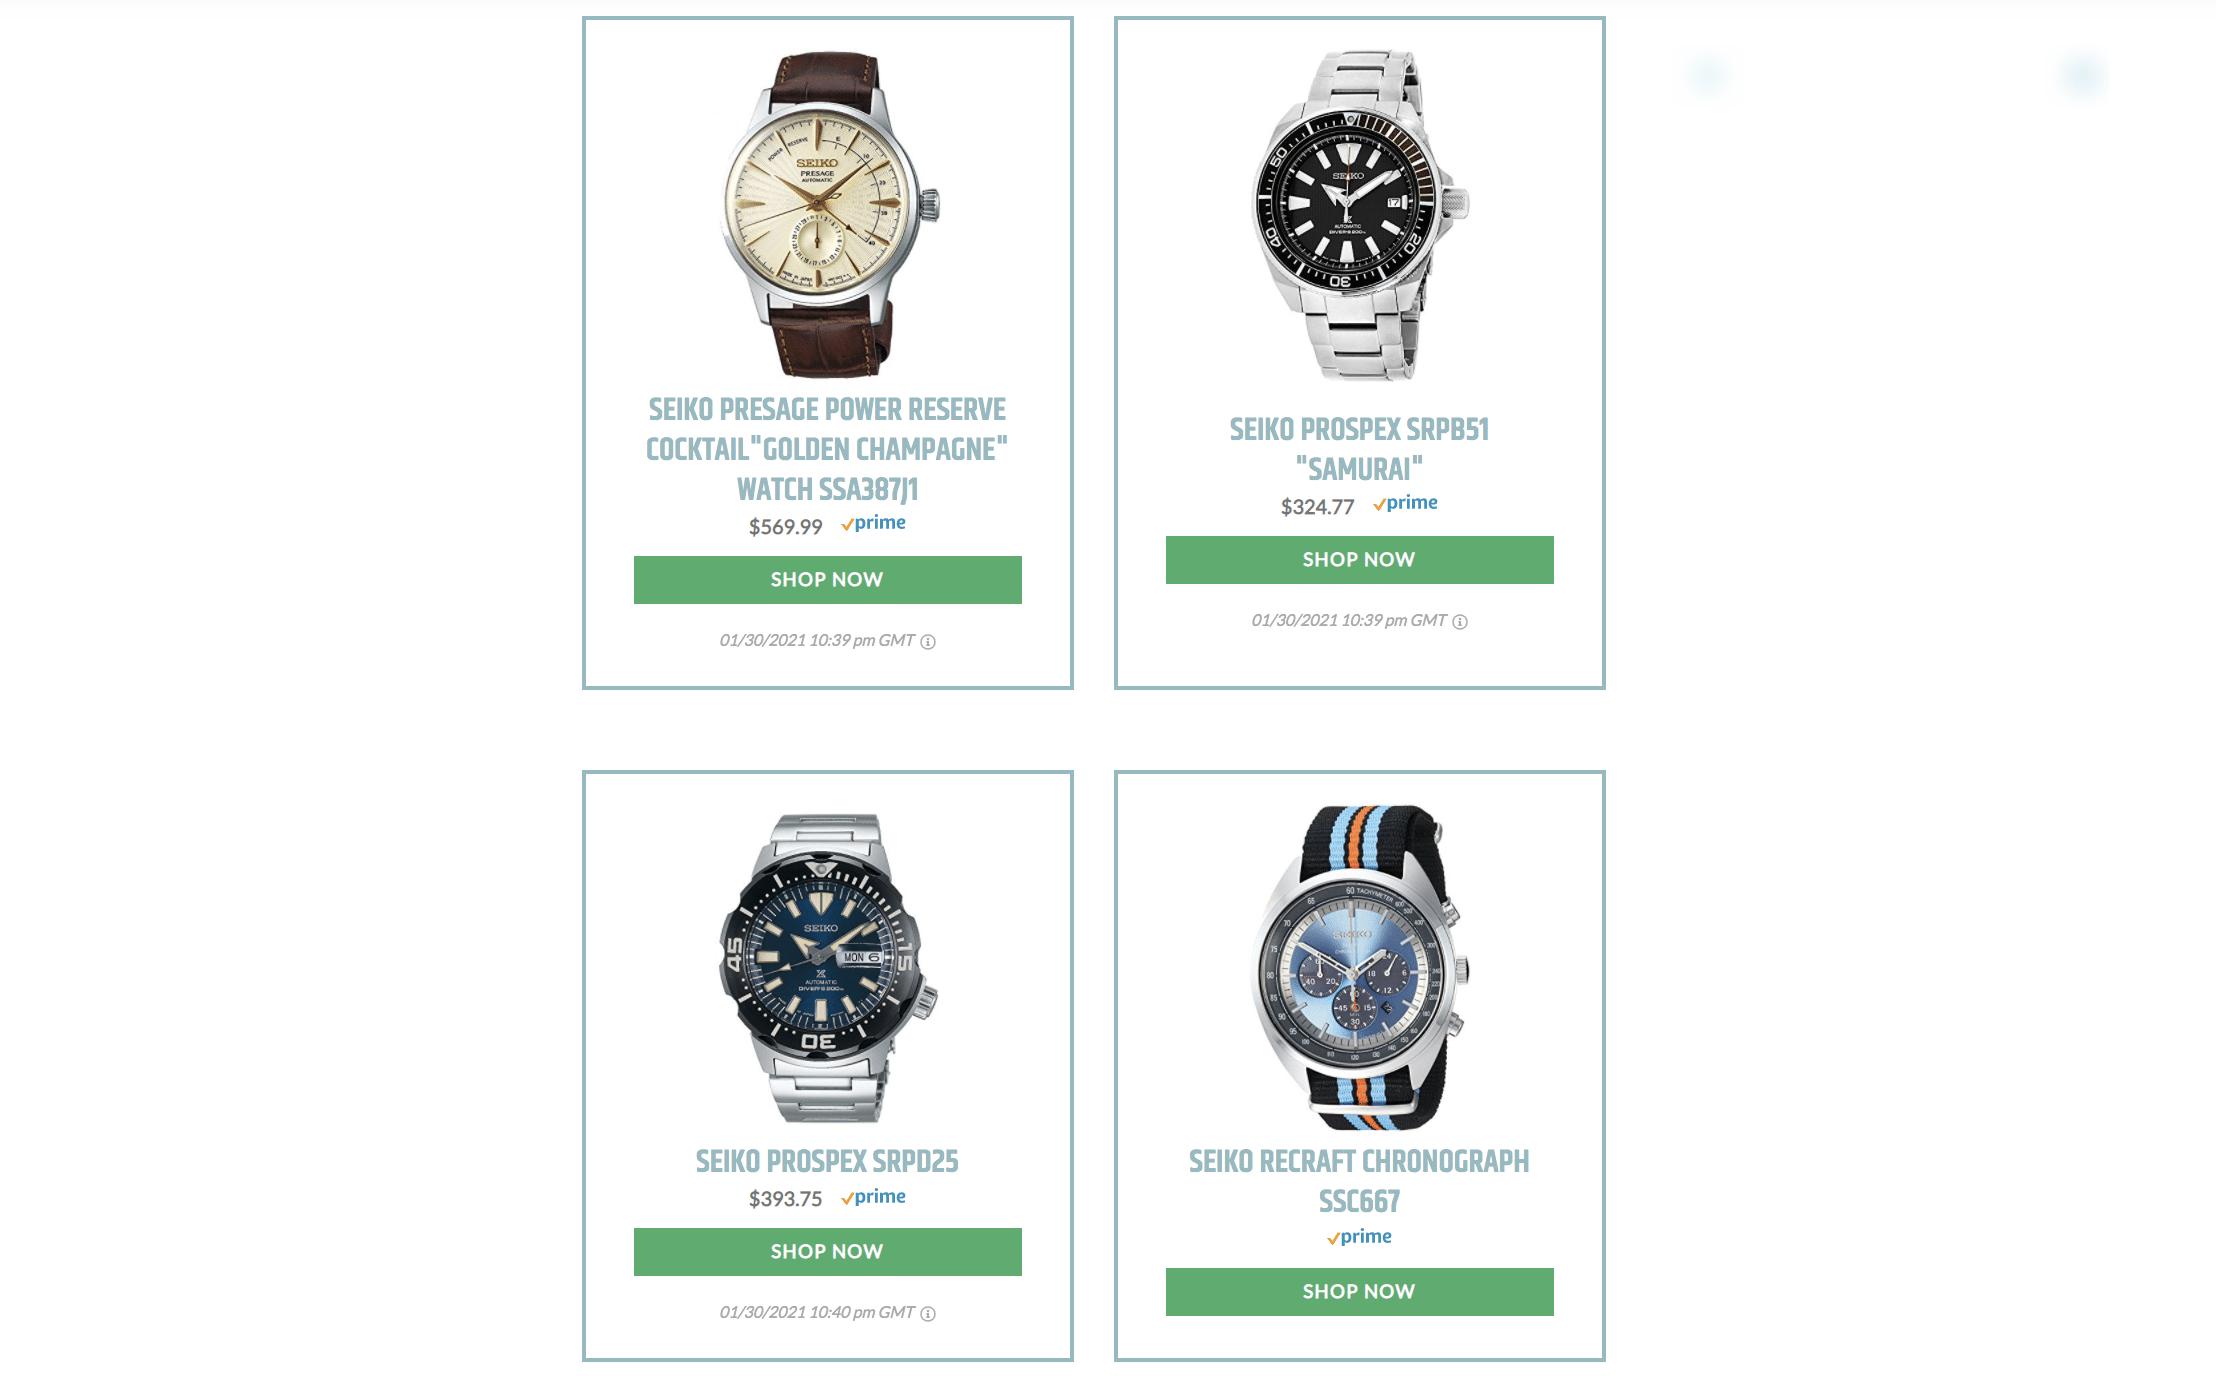 seiko grid watch display using lasso